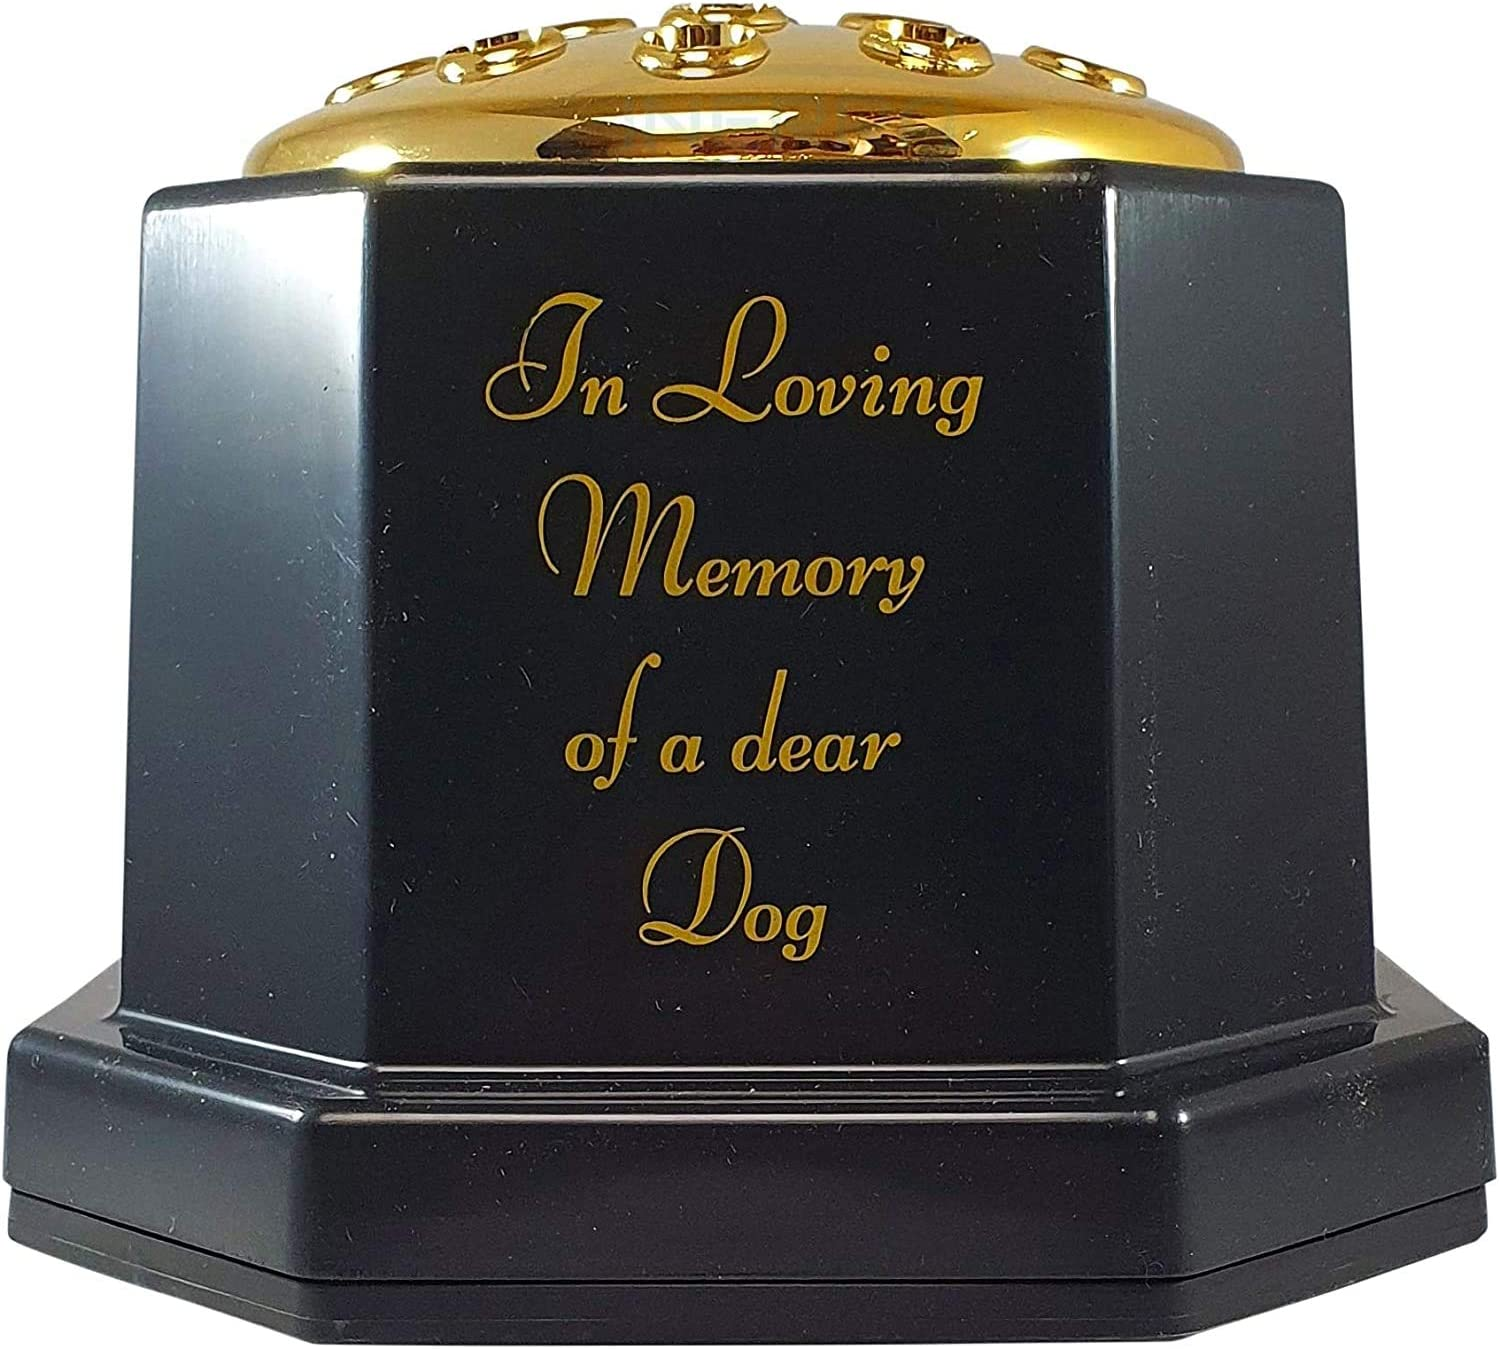 Daughter INERRA Memorial Grave Vase Black with Gold Lid Heavy /& Sturdy Pot for Graveside Flower Arrangements